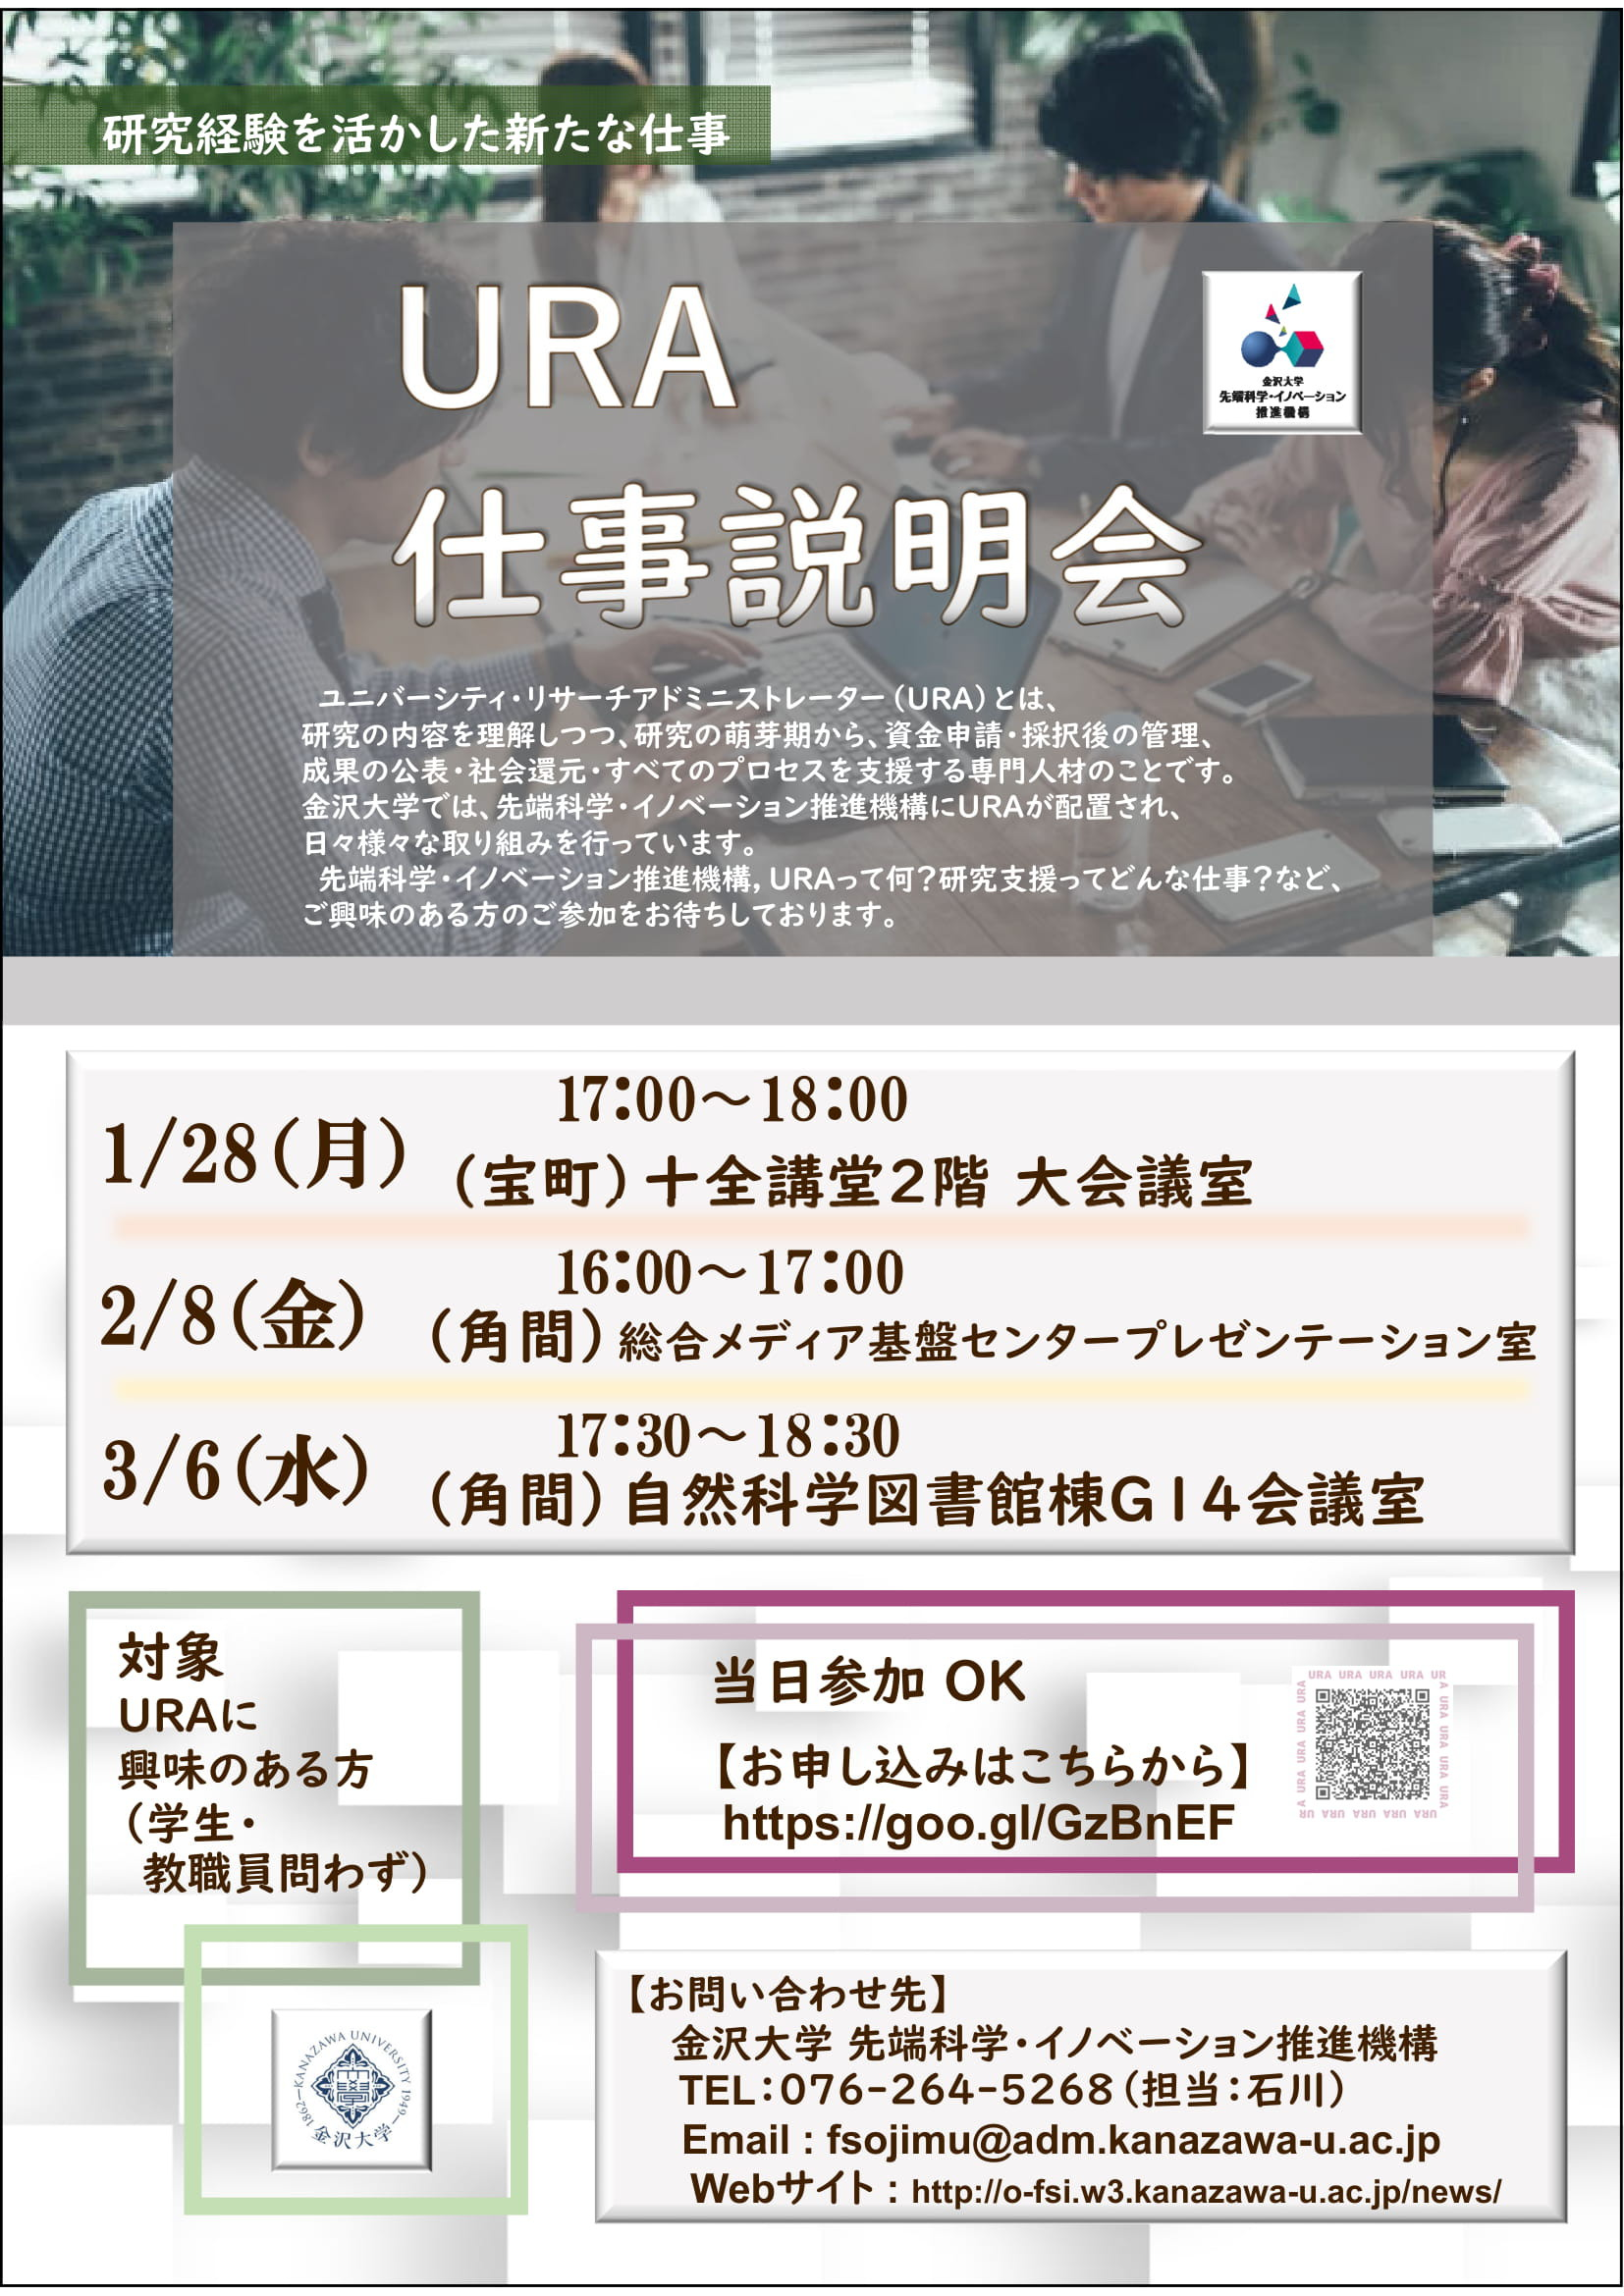 〇URA仕事説明会-1.jpg